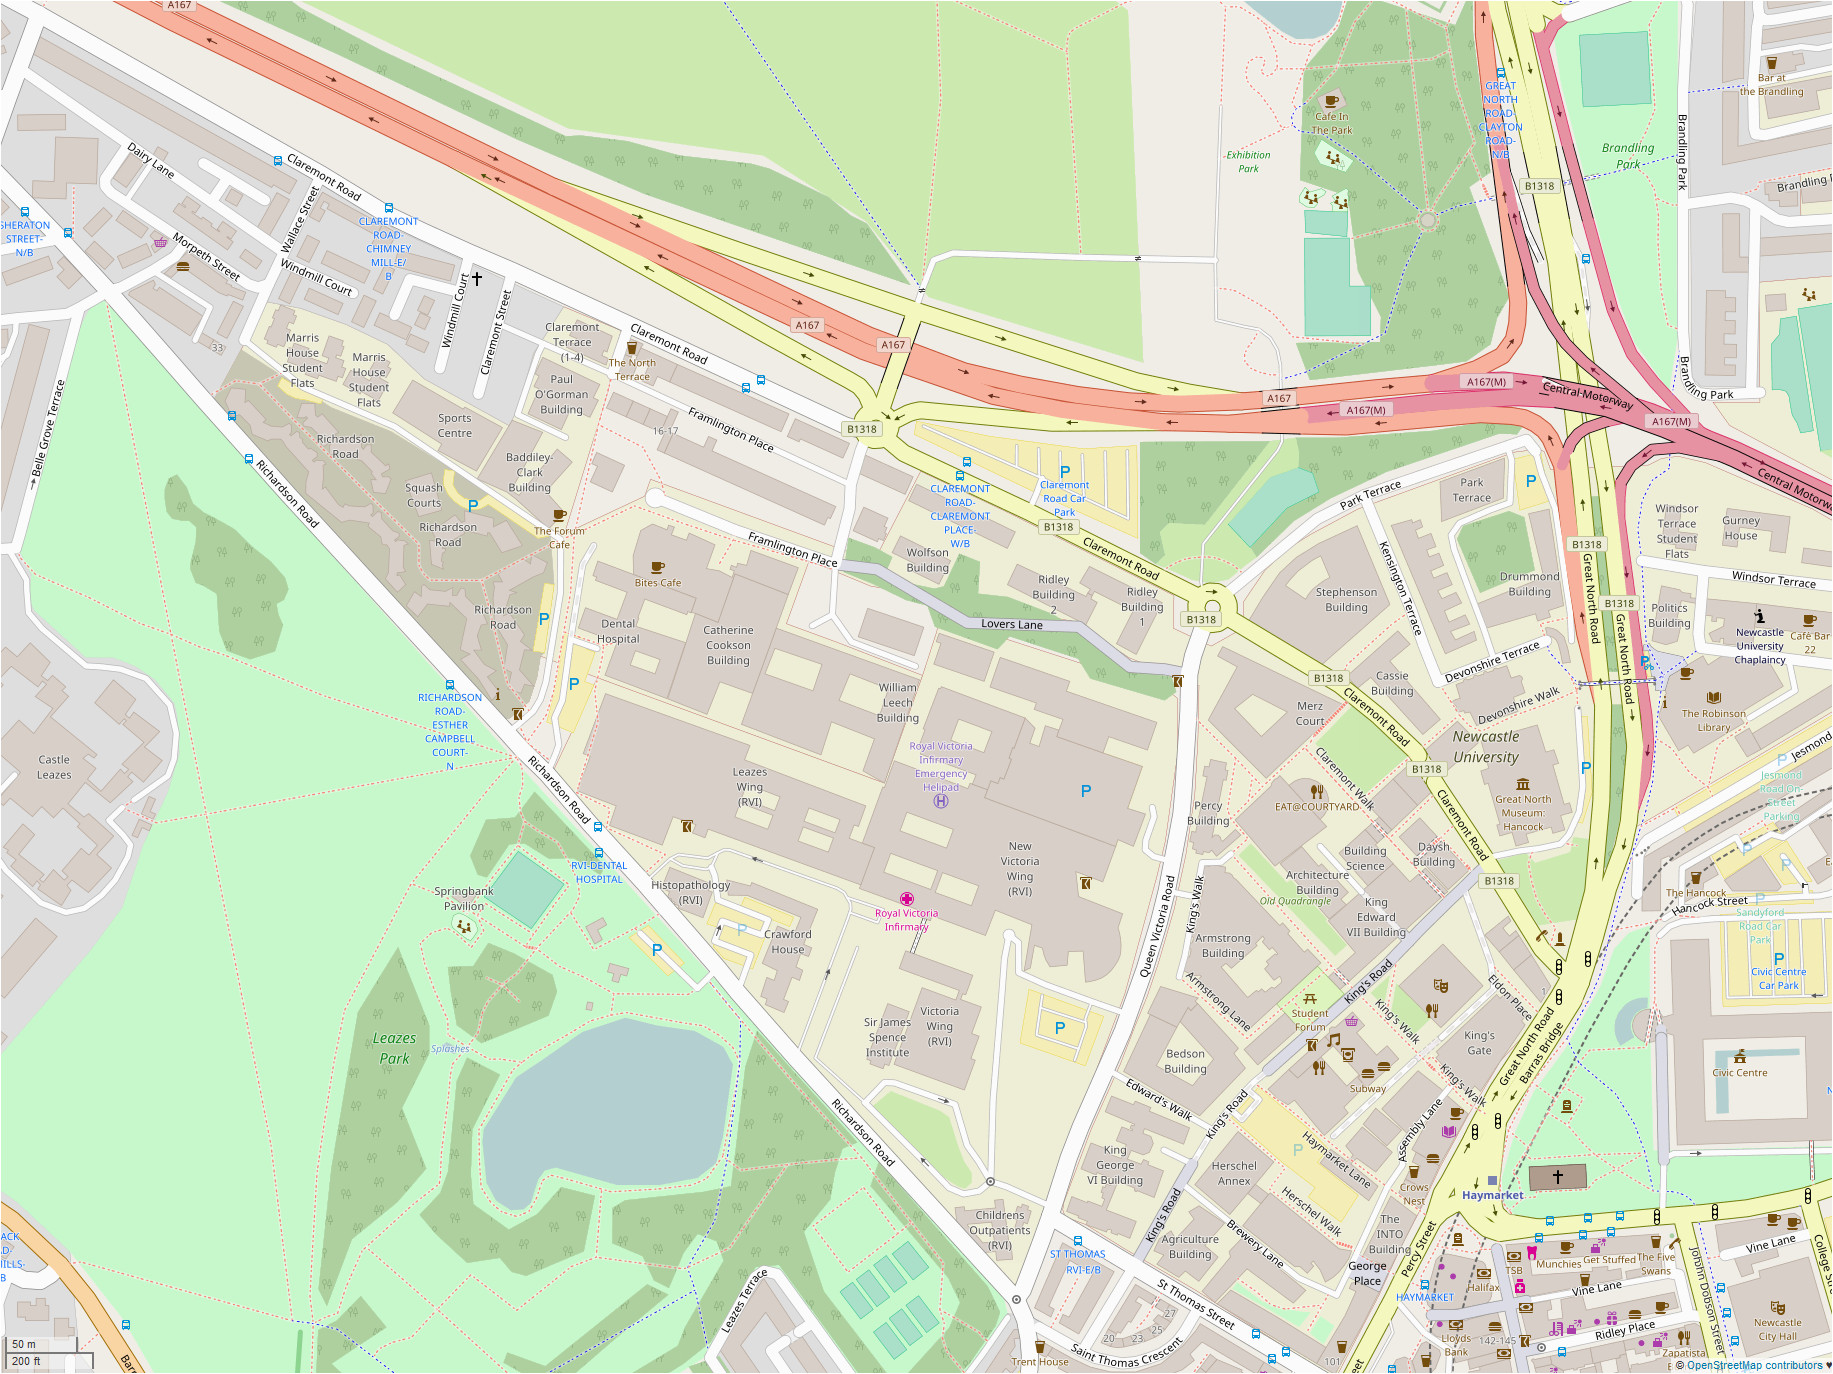 Newcastle Map Of England File Newcastle University Open Street Map Png Wikimedia